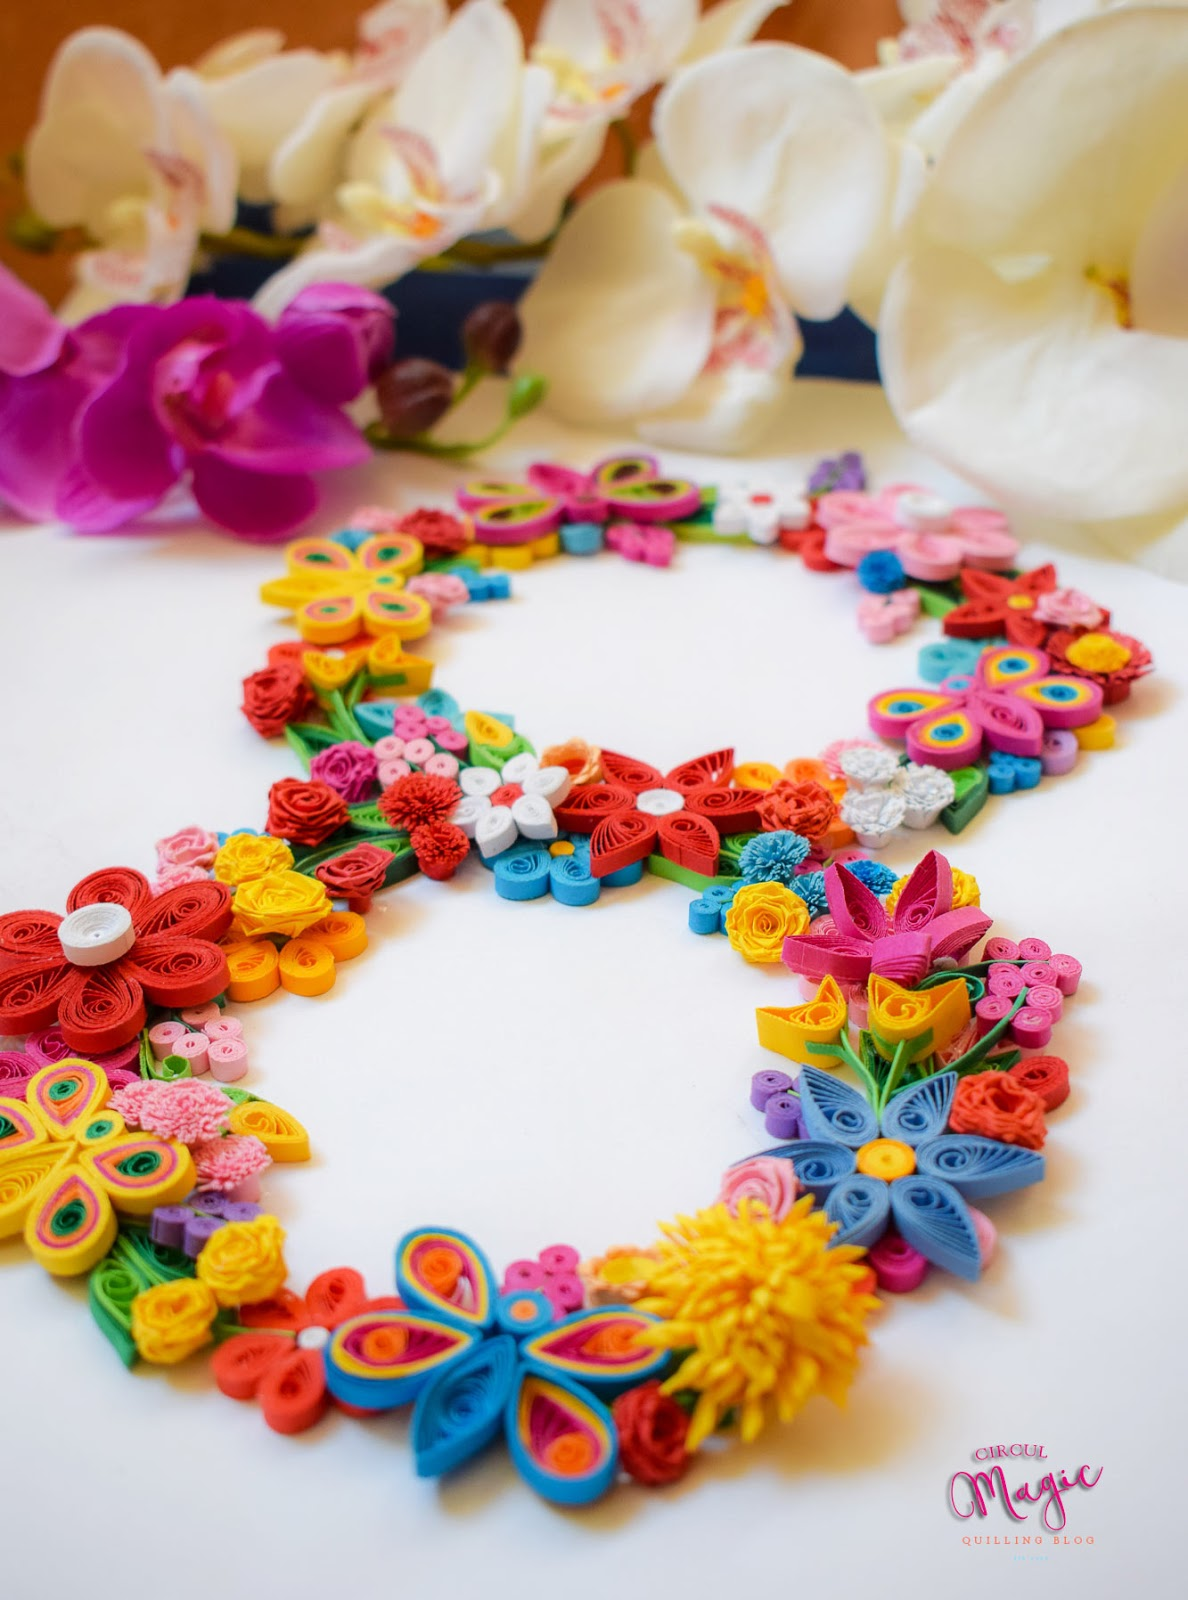 8 martie - numar quilling, flori si fluturi - cadou handmade circul magic